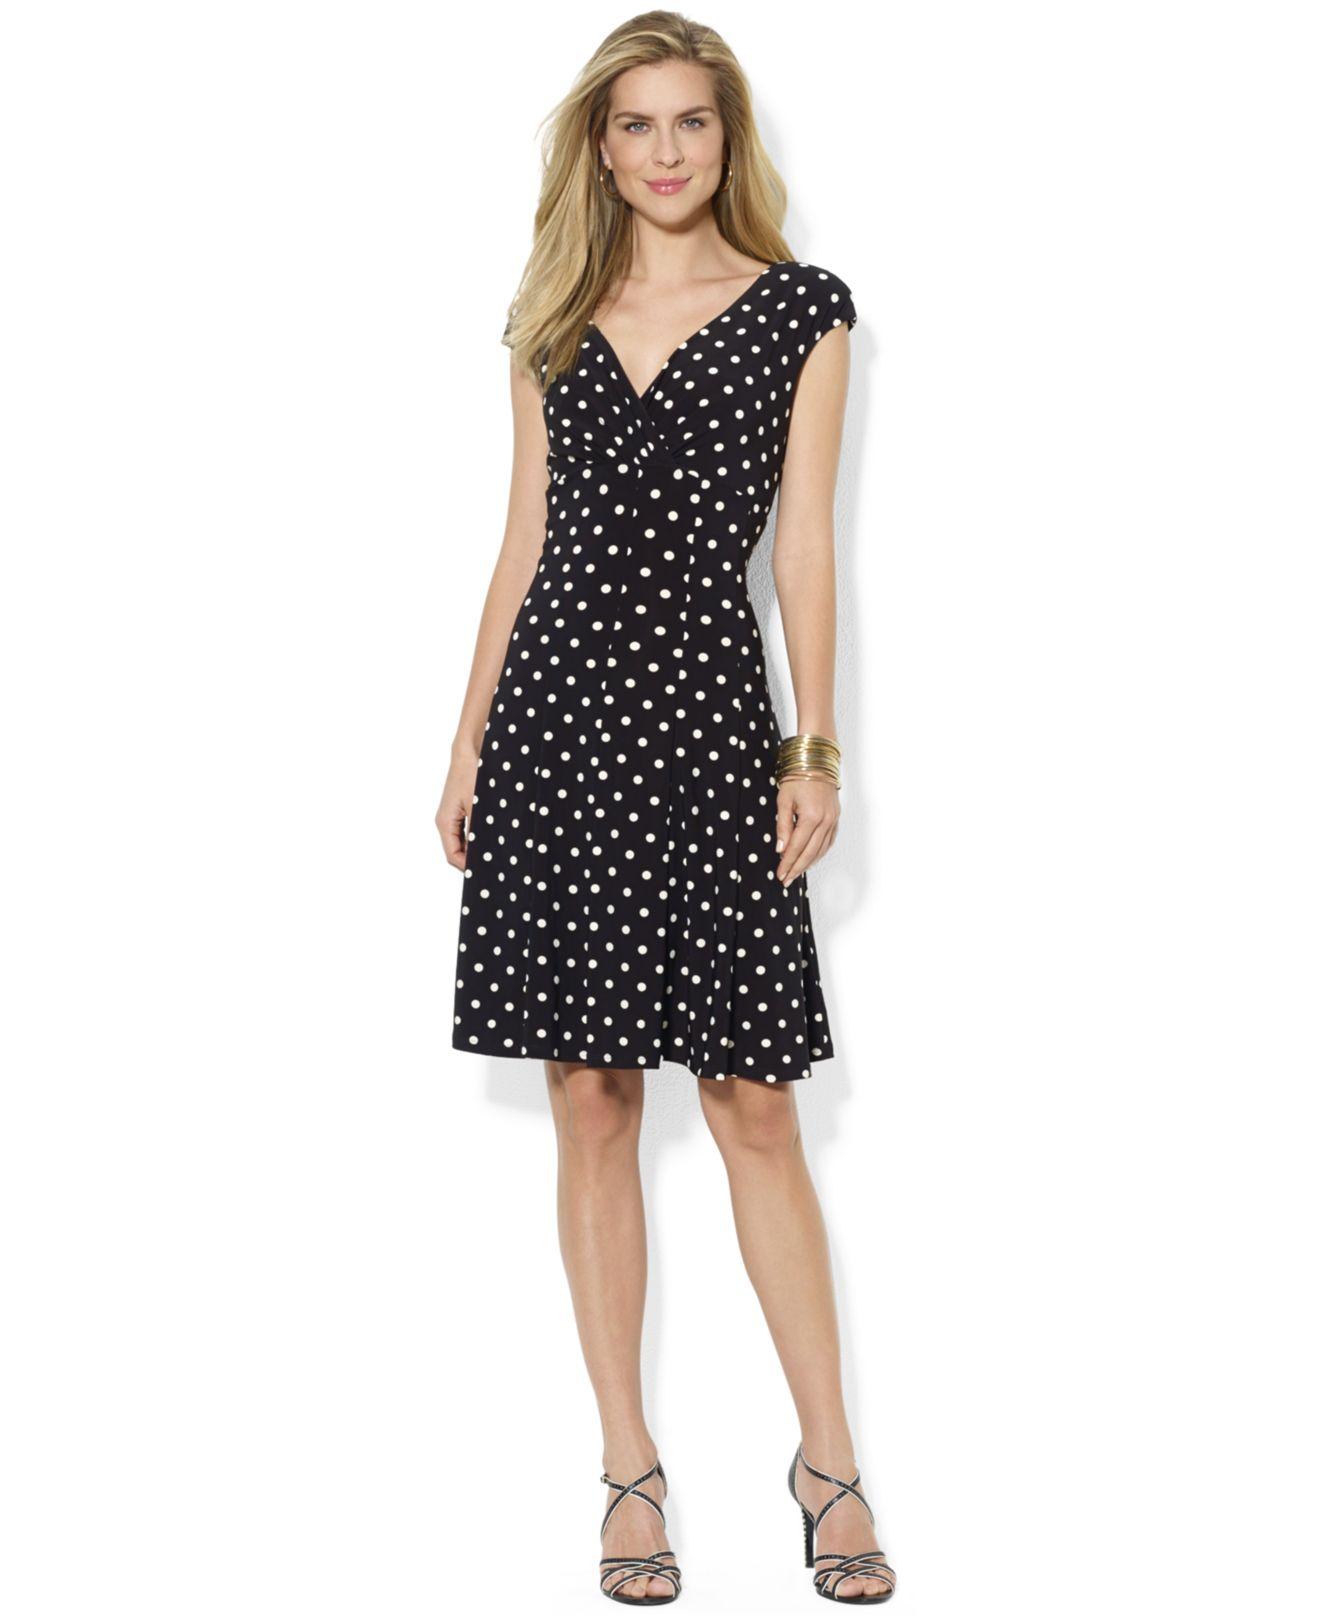 d14bf925c878 Lyst - Lauren by Ralph Lauren Petite Polka Dot Print Dress in Black